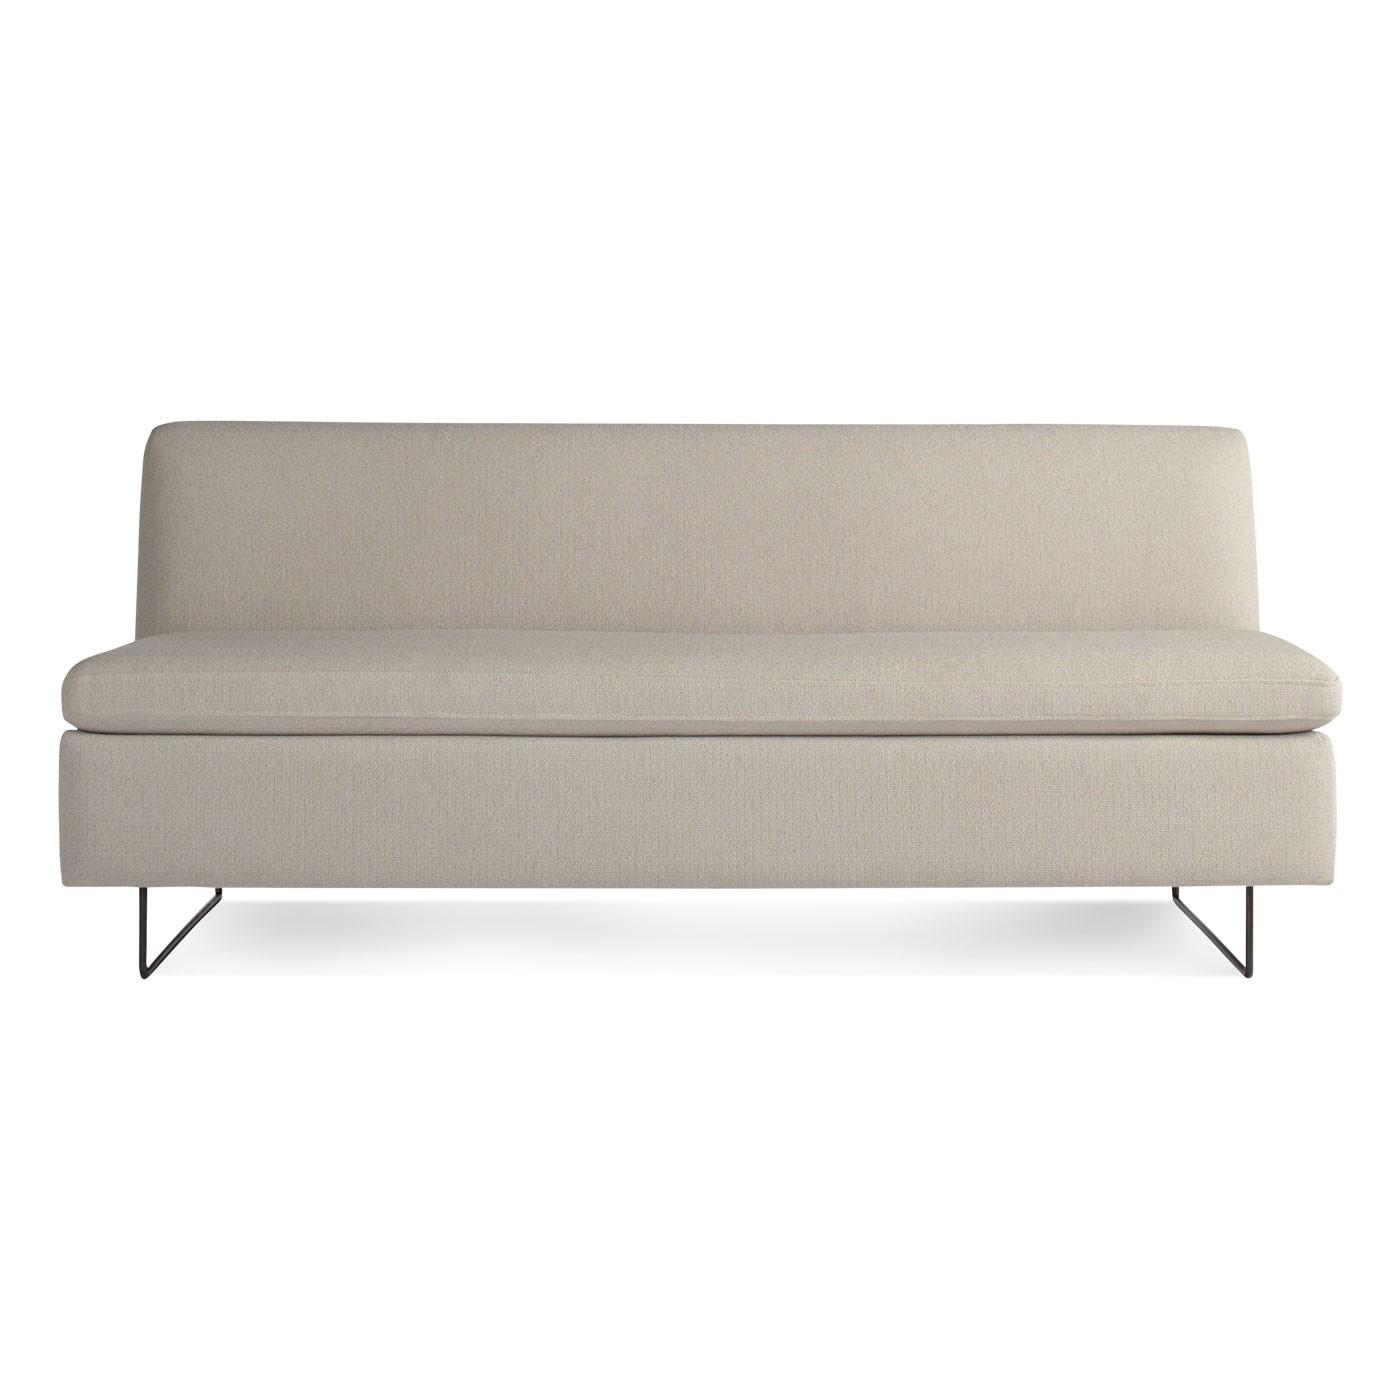 Furniture: Linen Upholstered Armless Sofa For Modern Living Room Design Regarding Small Armless Sofas (Image 3 of 10)